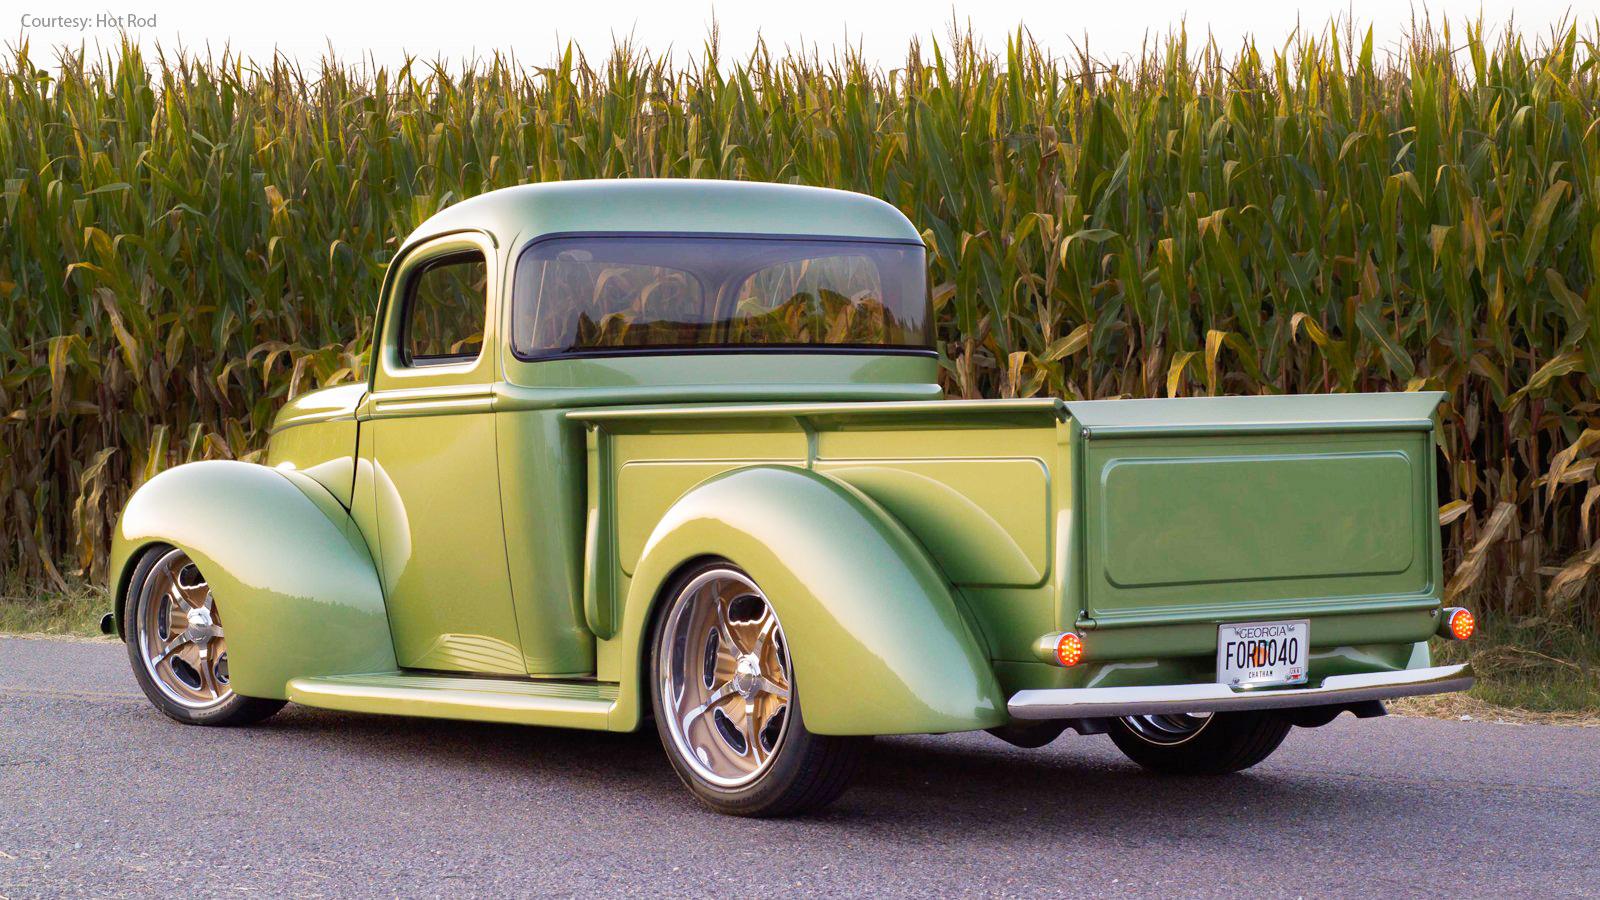 1940 Ford 1 2 Ton Pickup Truck 5.0L Coyote 2.jpg